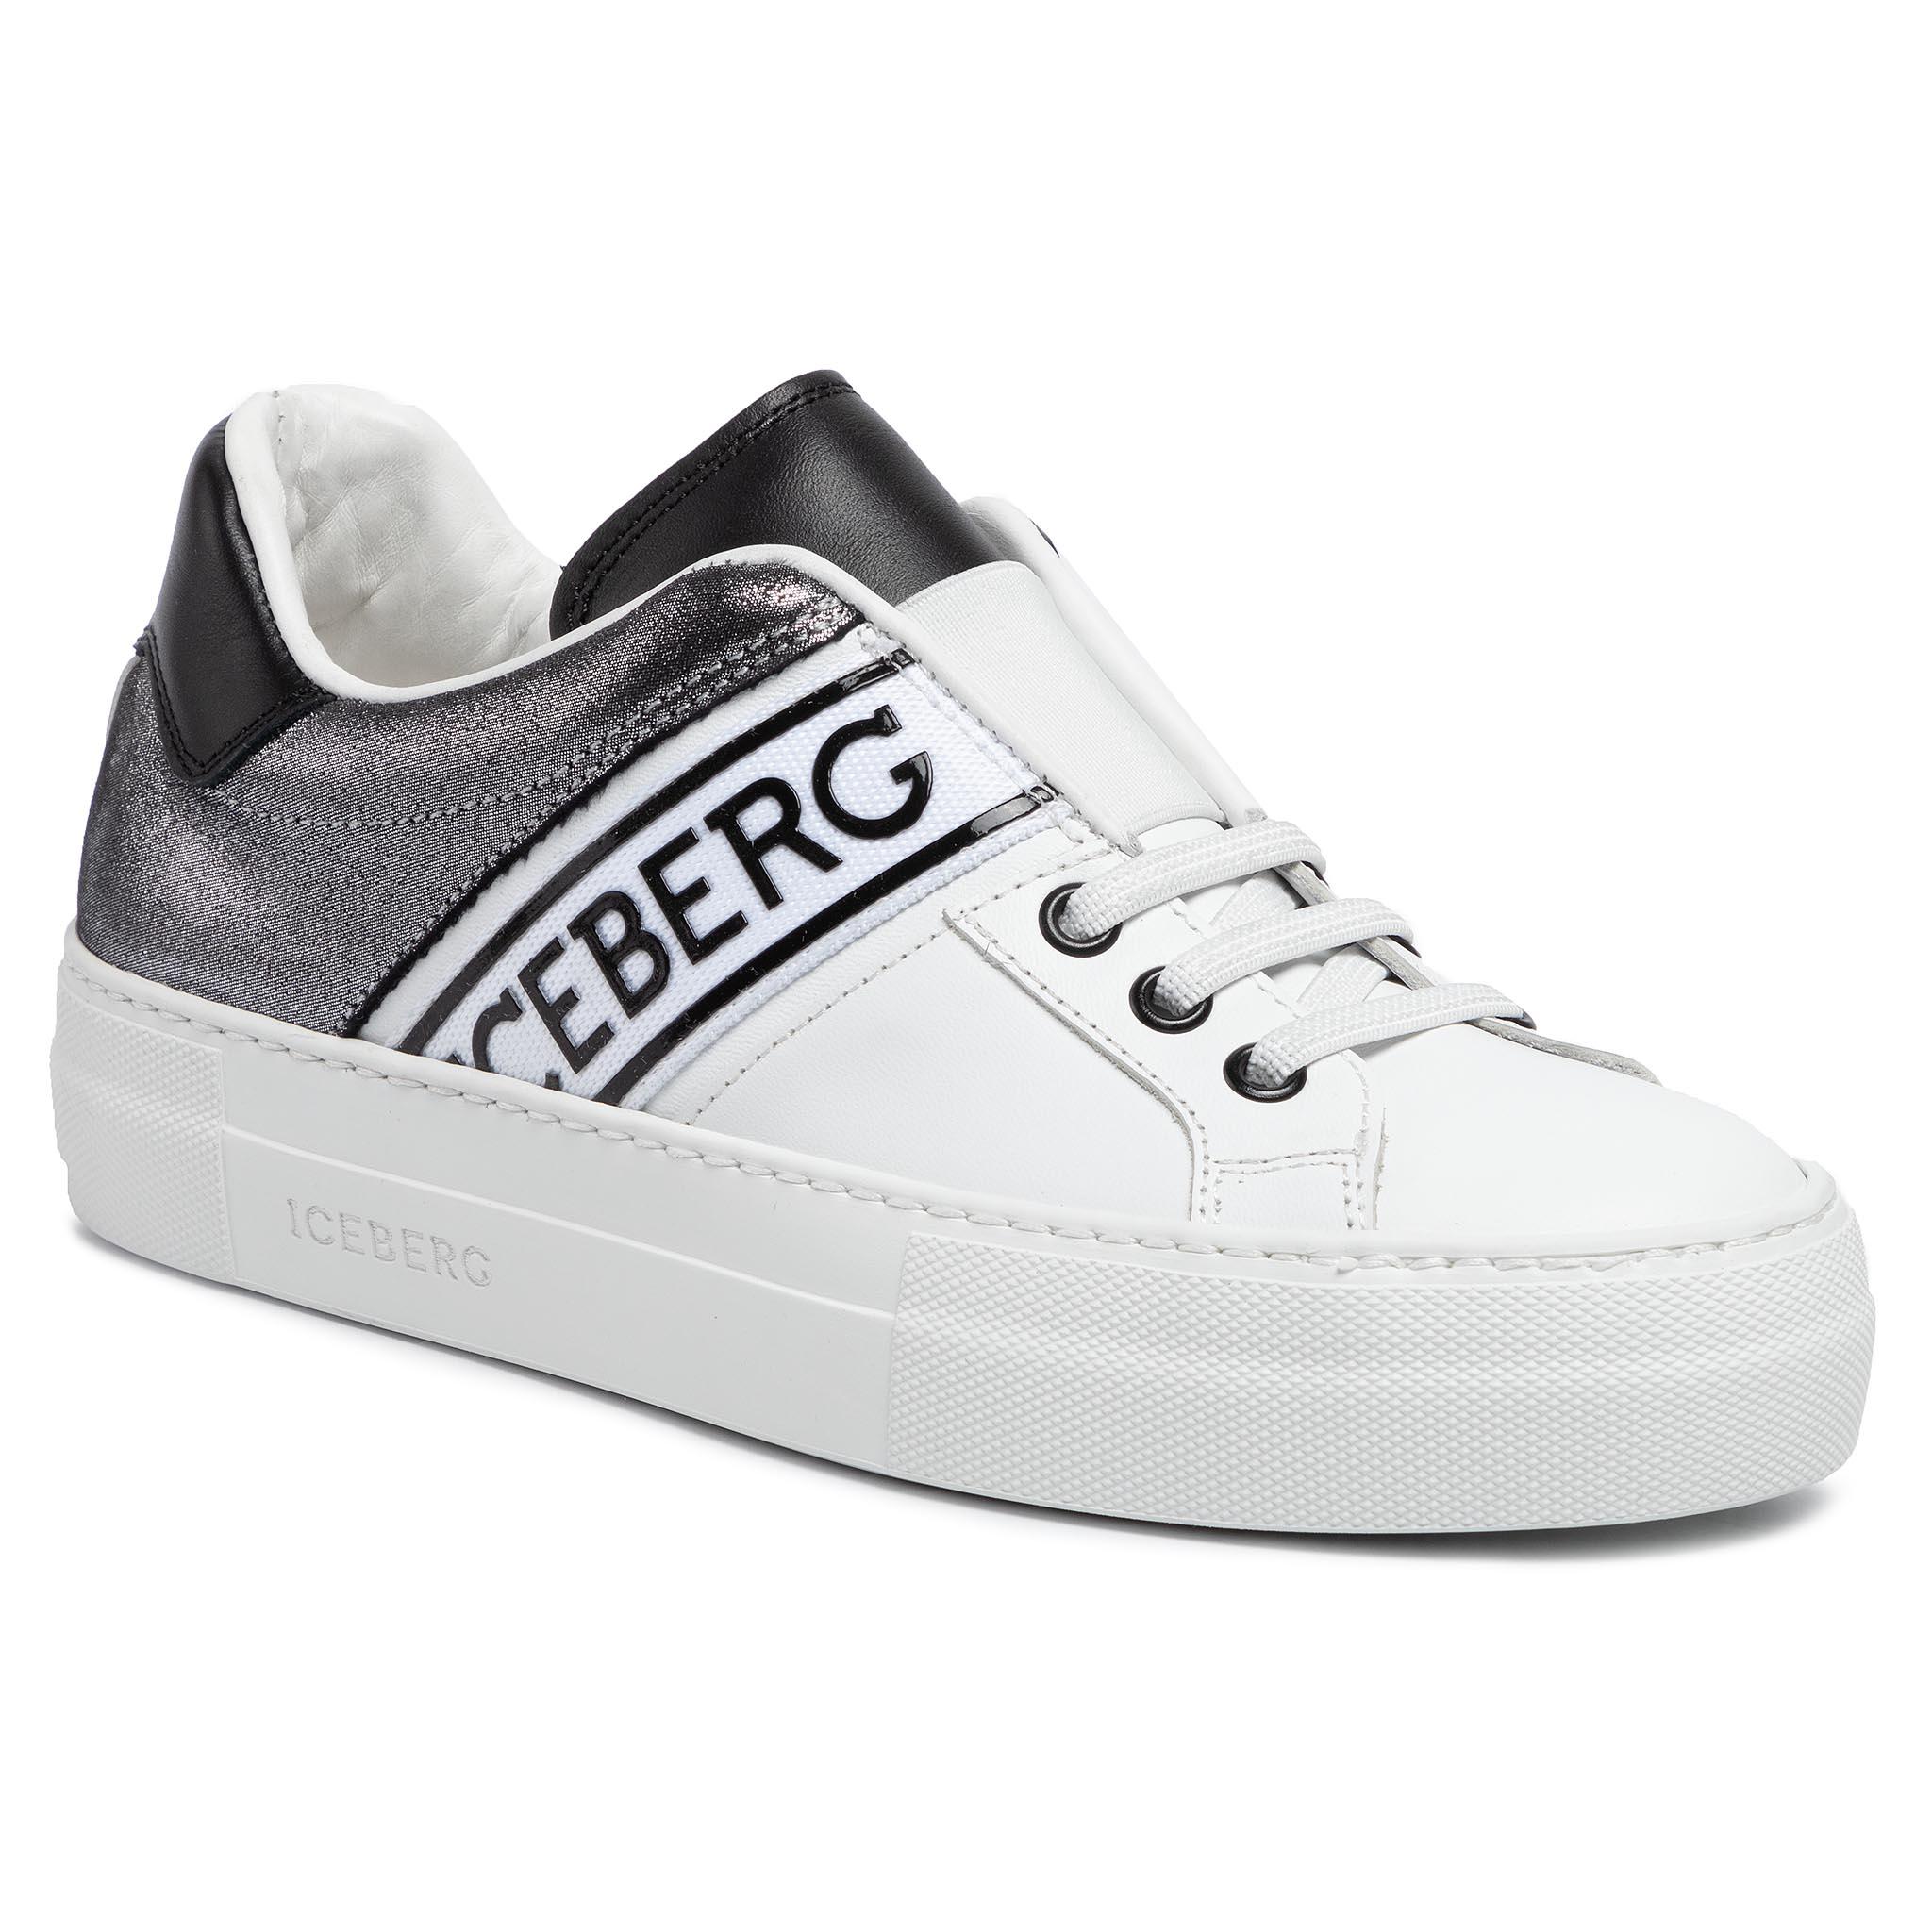 Image of Sneakers ICEBERG - Gioia 19IID1631A Comb.White